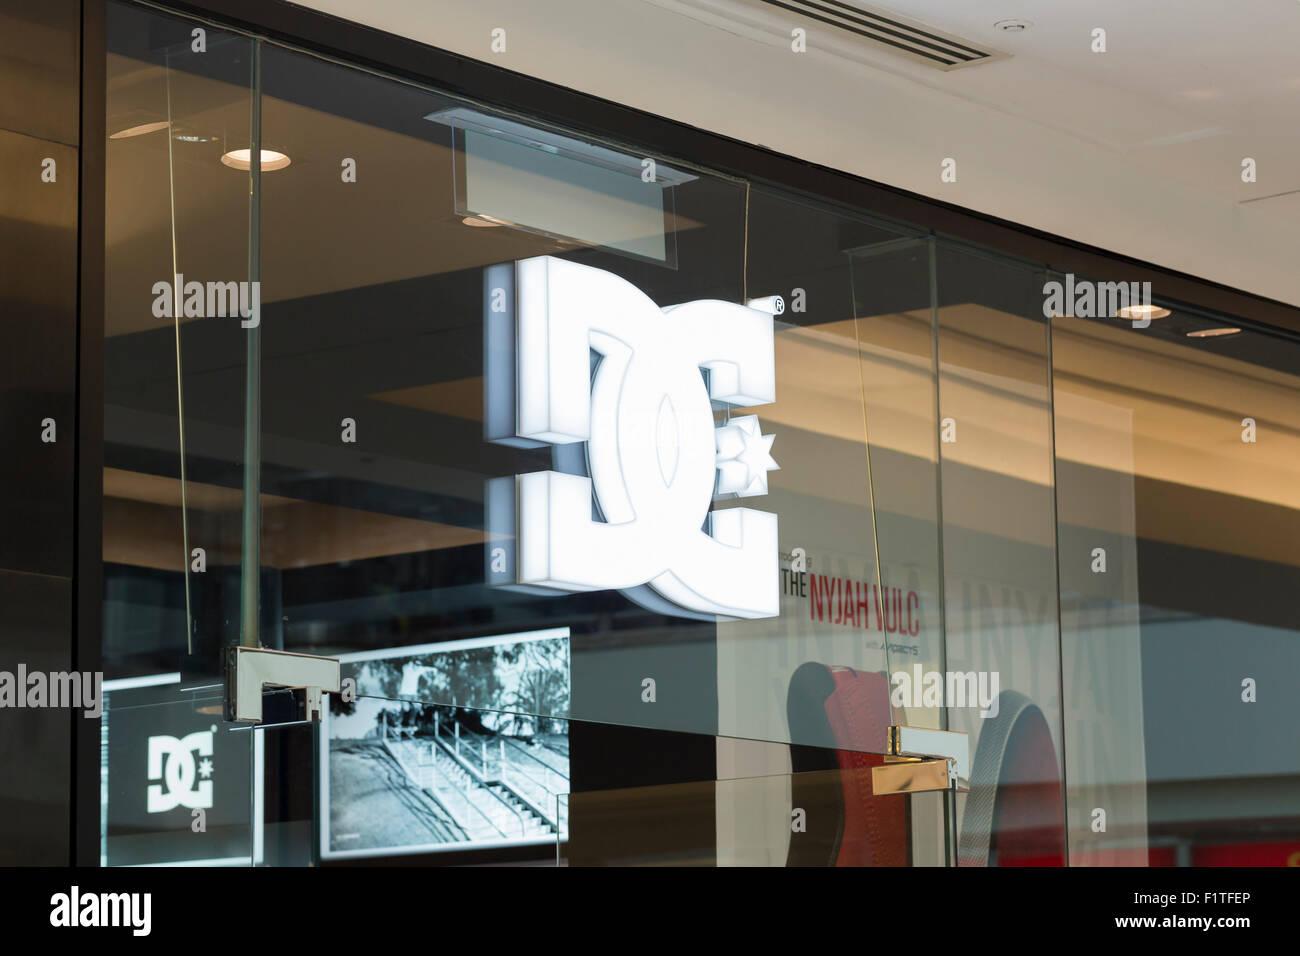 Dolce & Gabbana logo - Stock Image